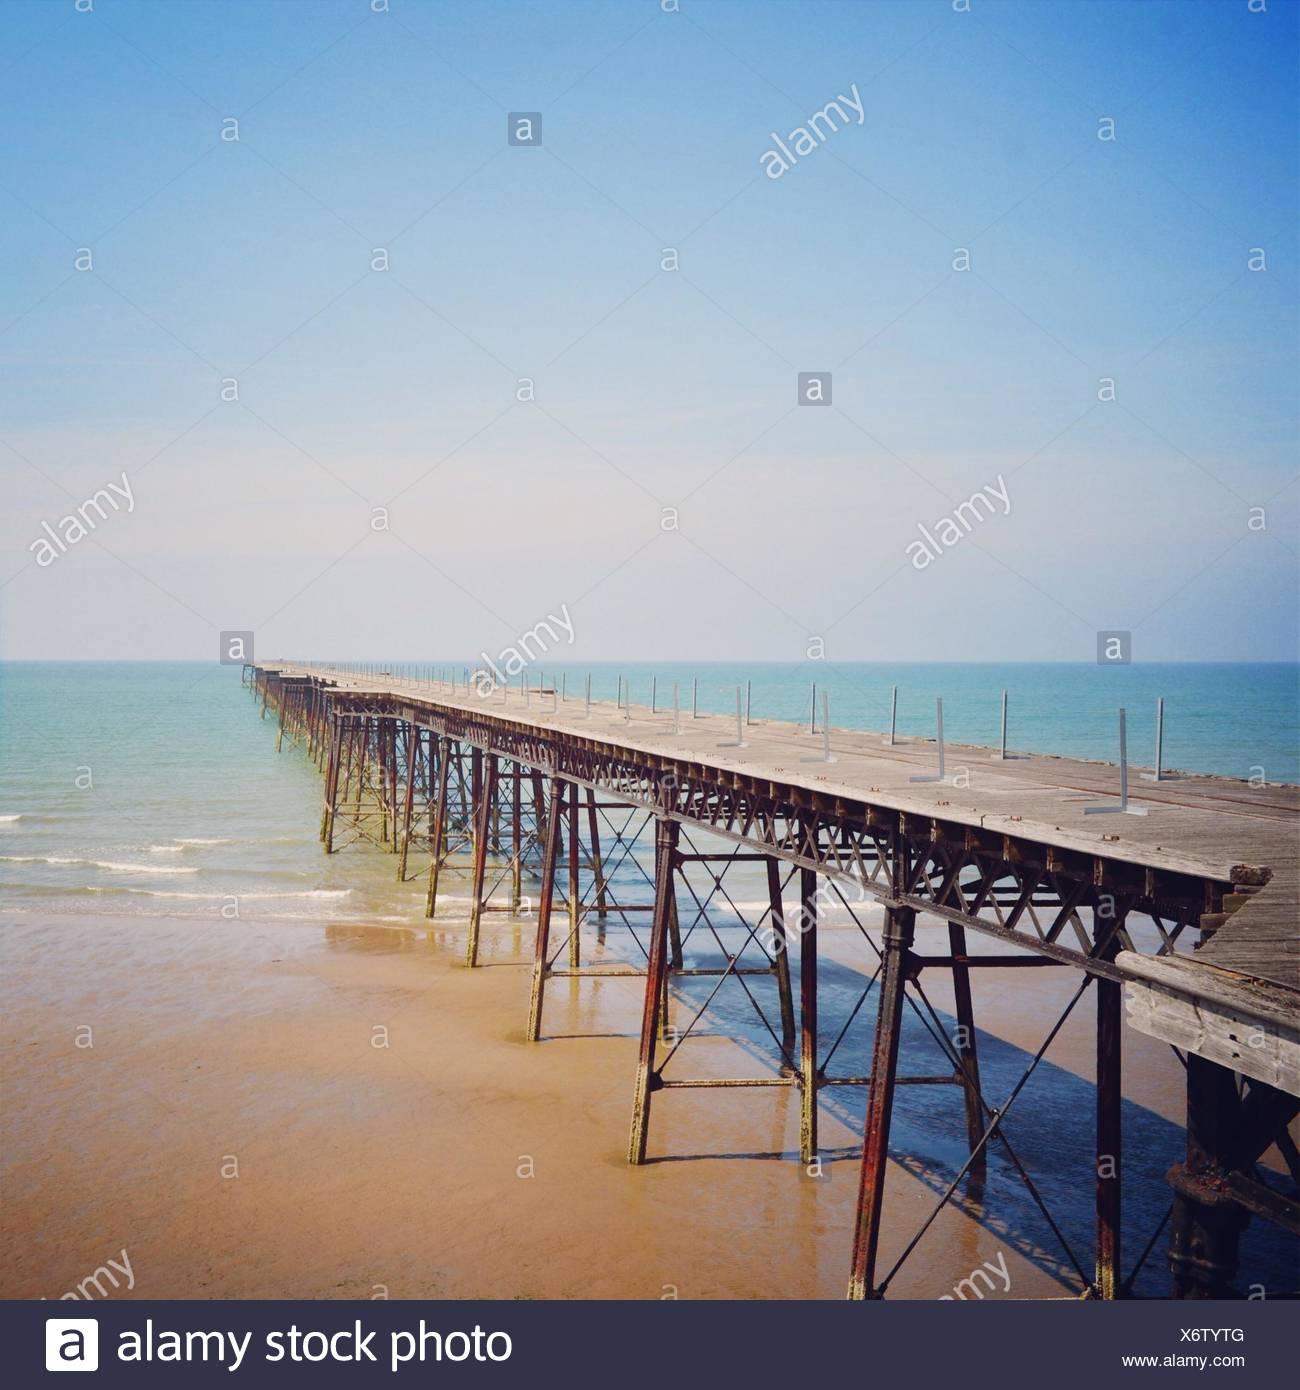 Empty wooden pier - Stock Image